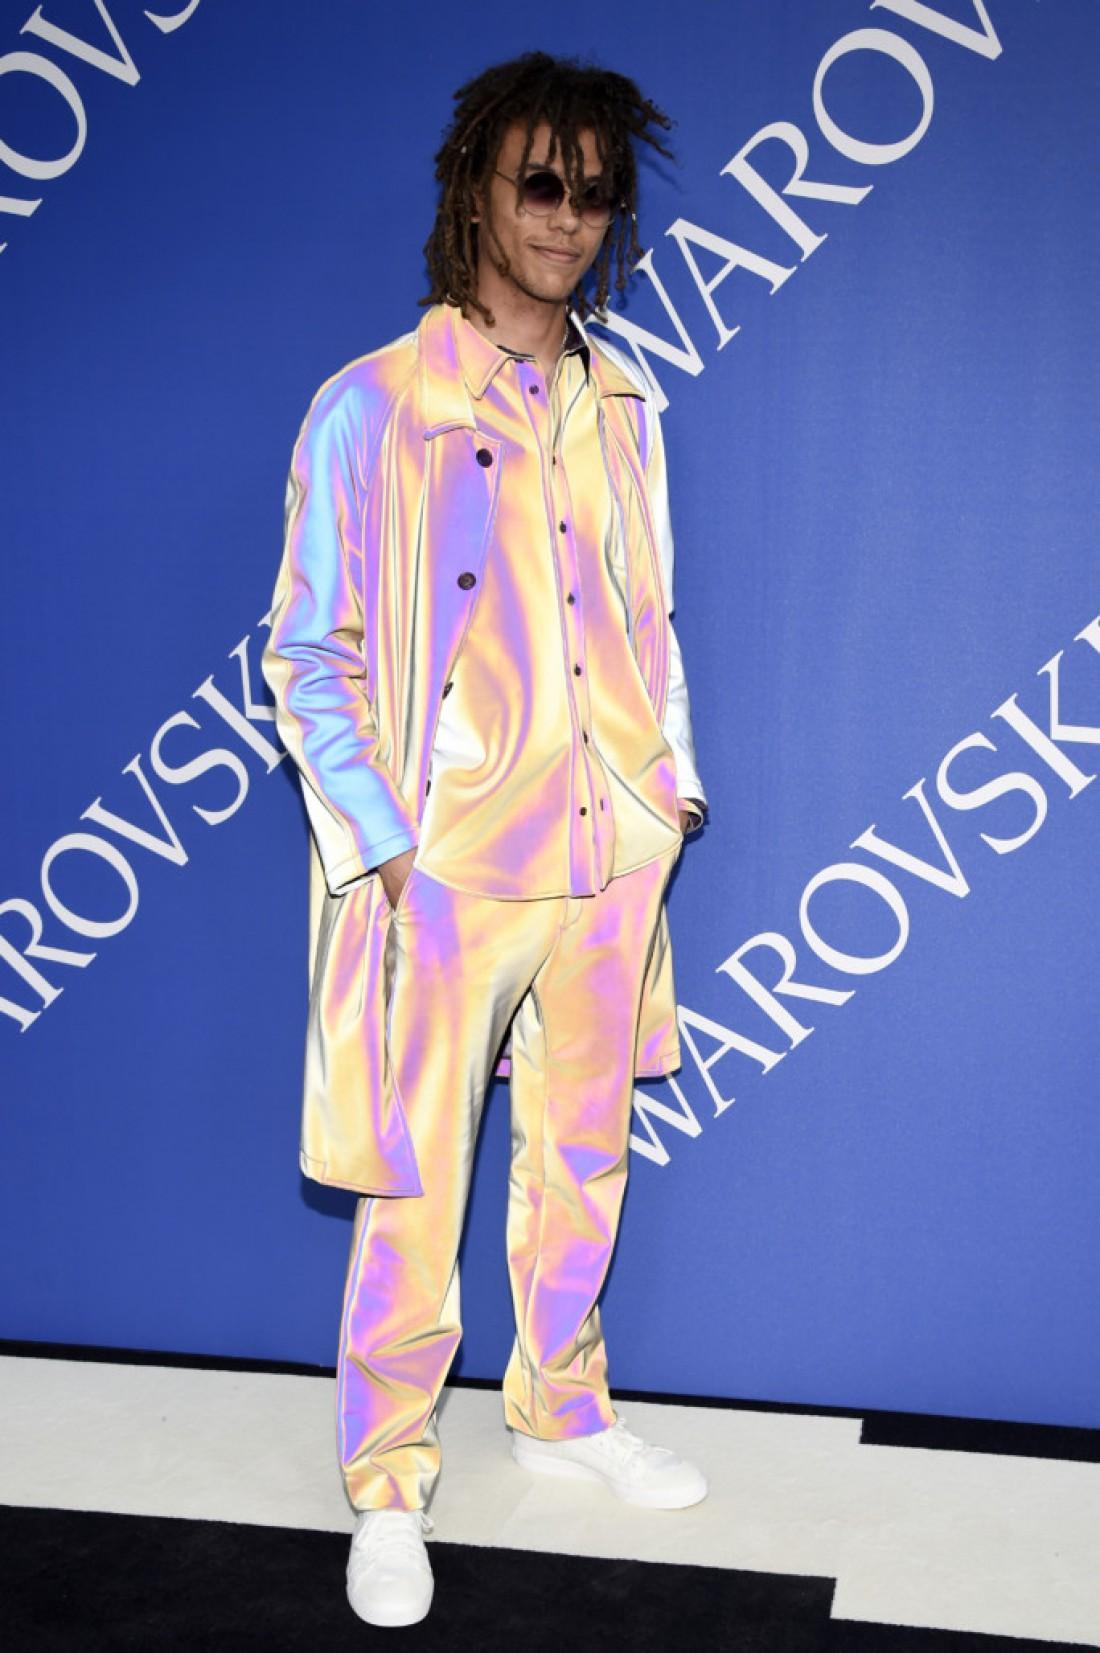 Роберто Росселлини на церемонии CFDA в Нью-Йорке